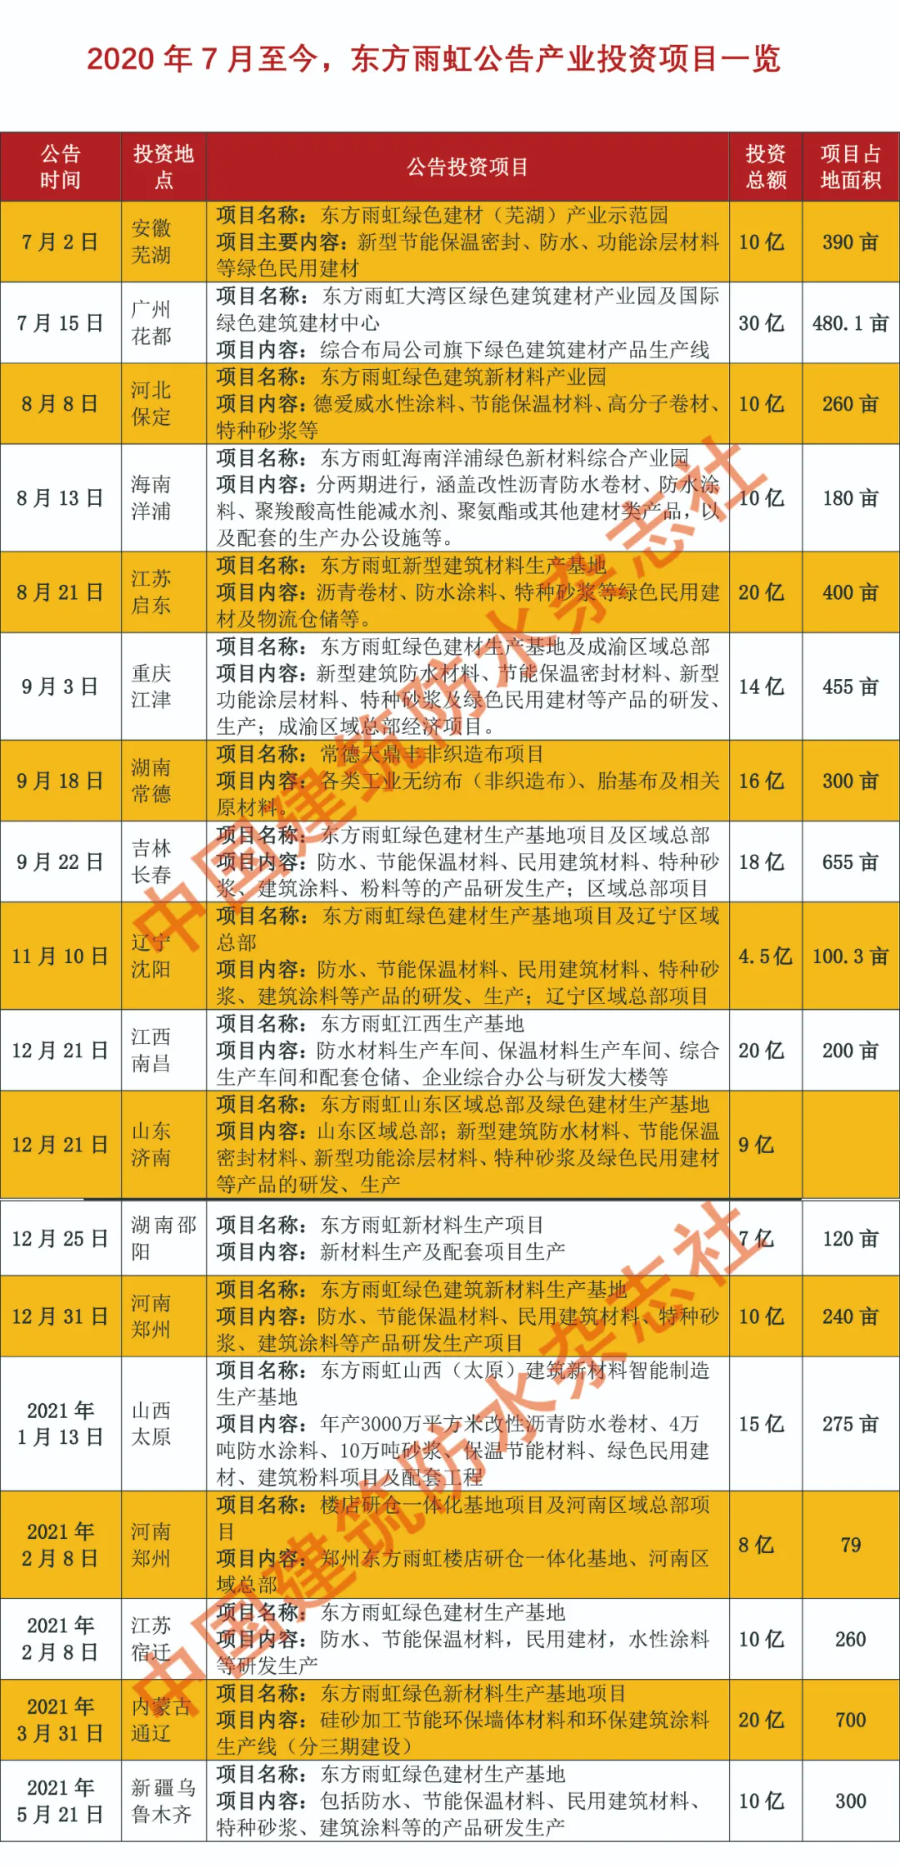 导出图片Wed Jun 09 2021 15_30_18 GMT+0800 (中国标准时间).png